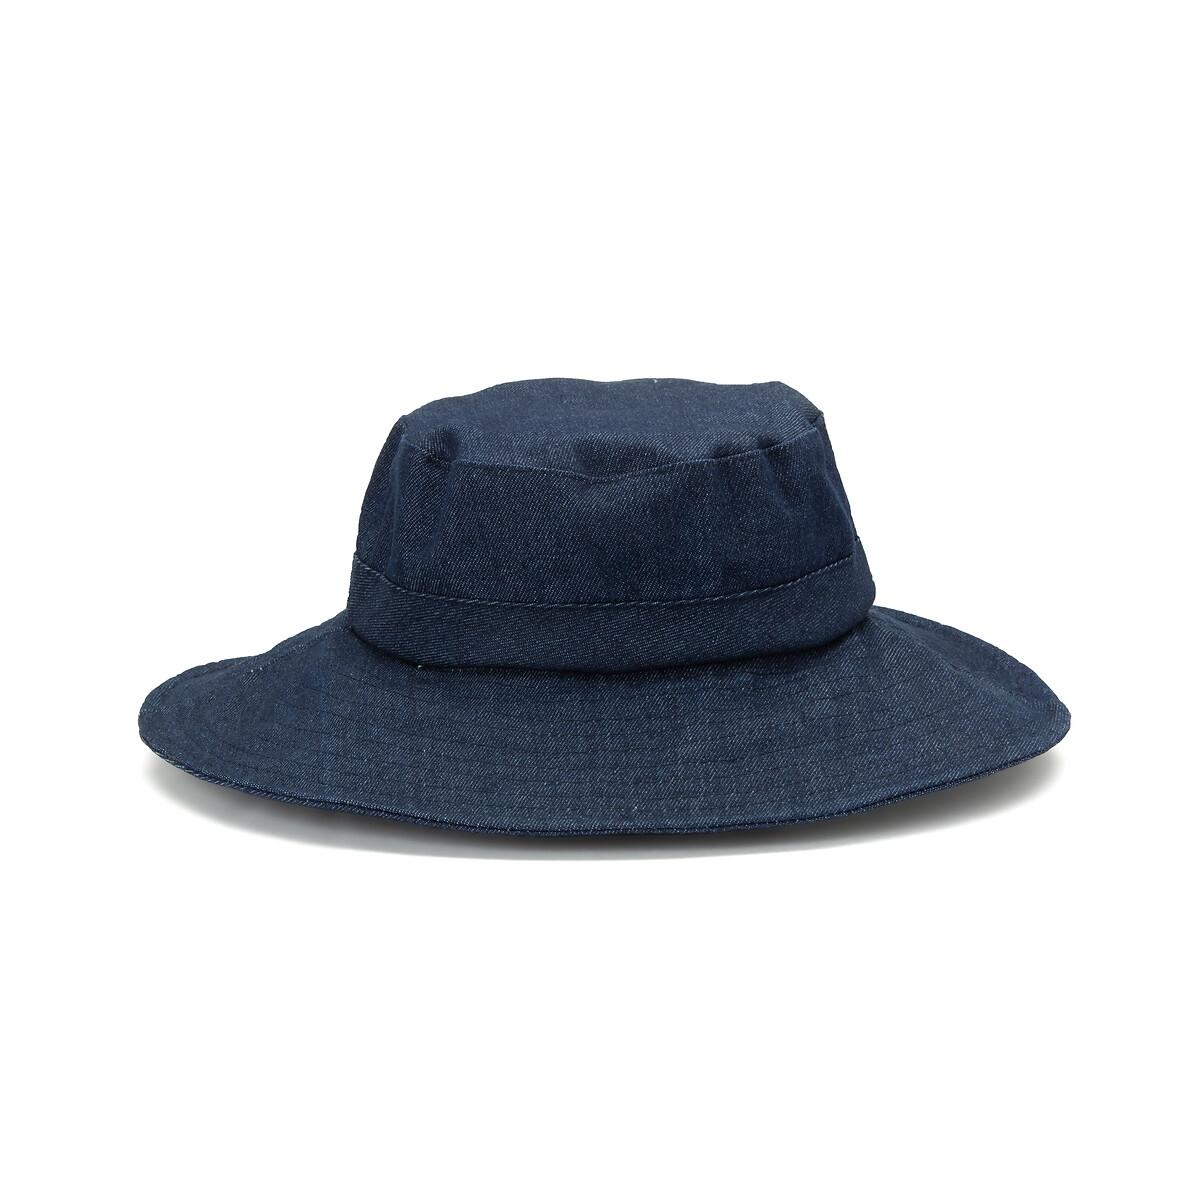 сарафан la redoute из легкого денима 5 лет 108 см синий Шляпа La Redoute Из денима UNI синий